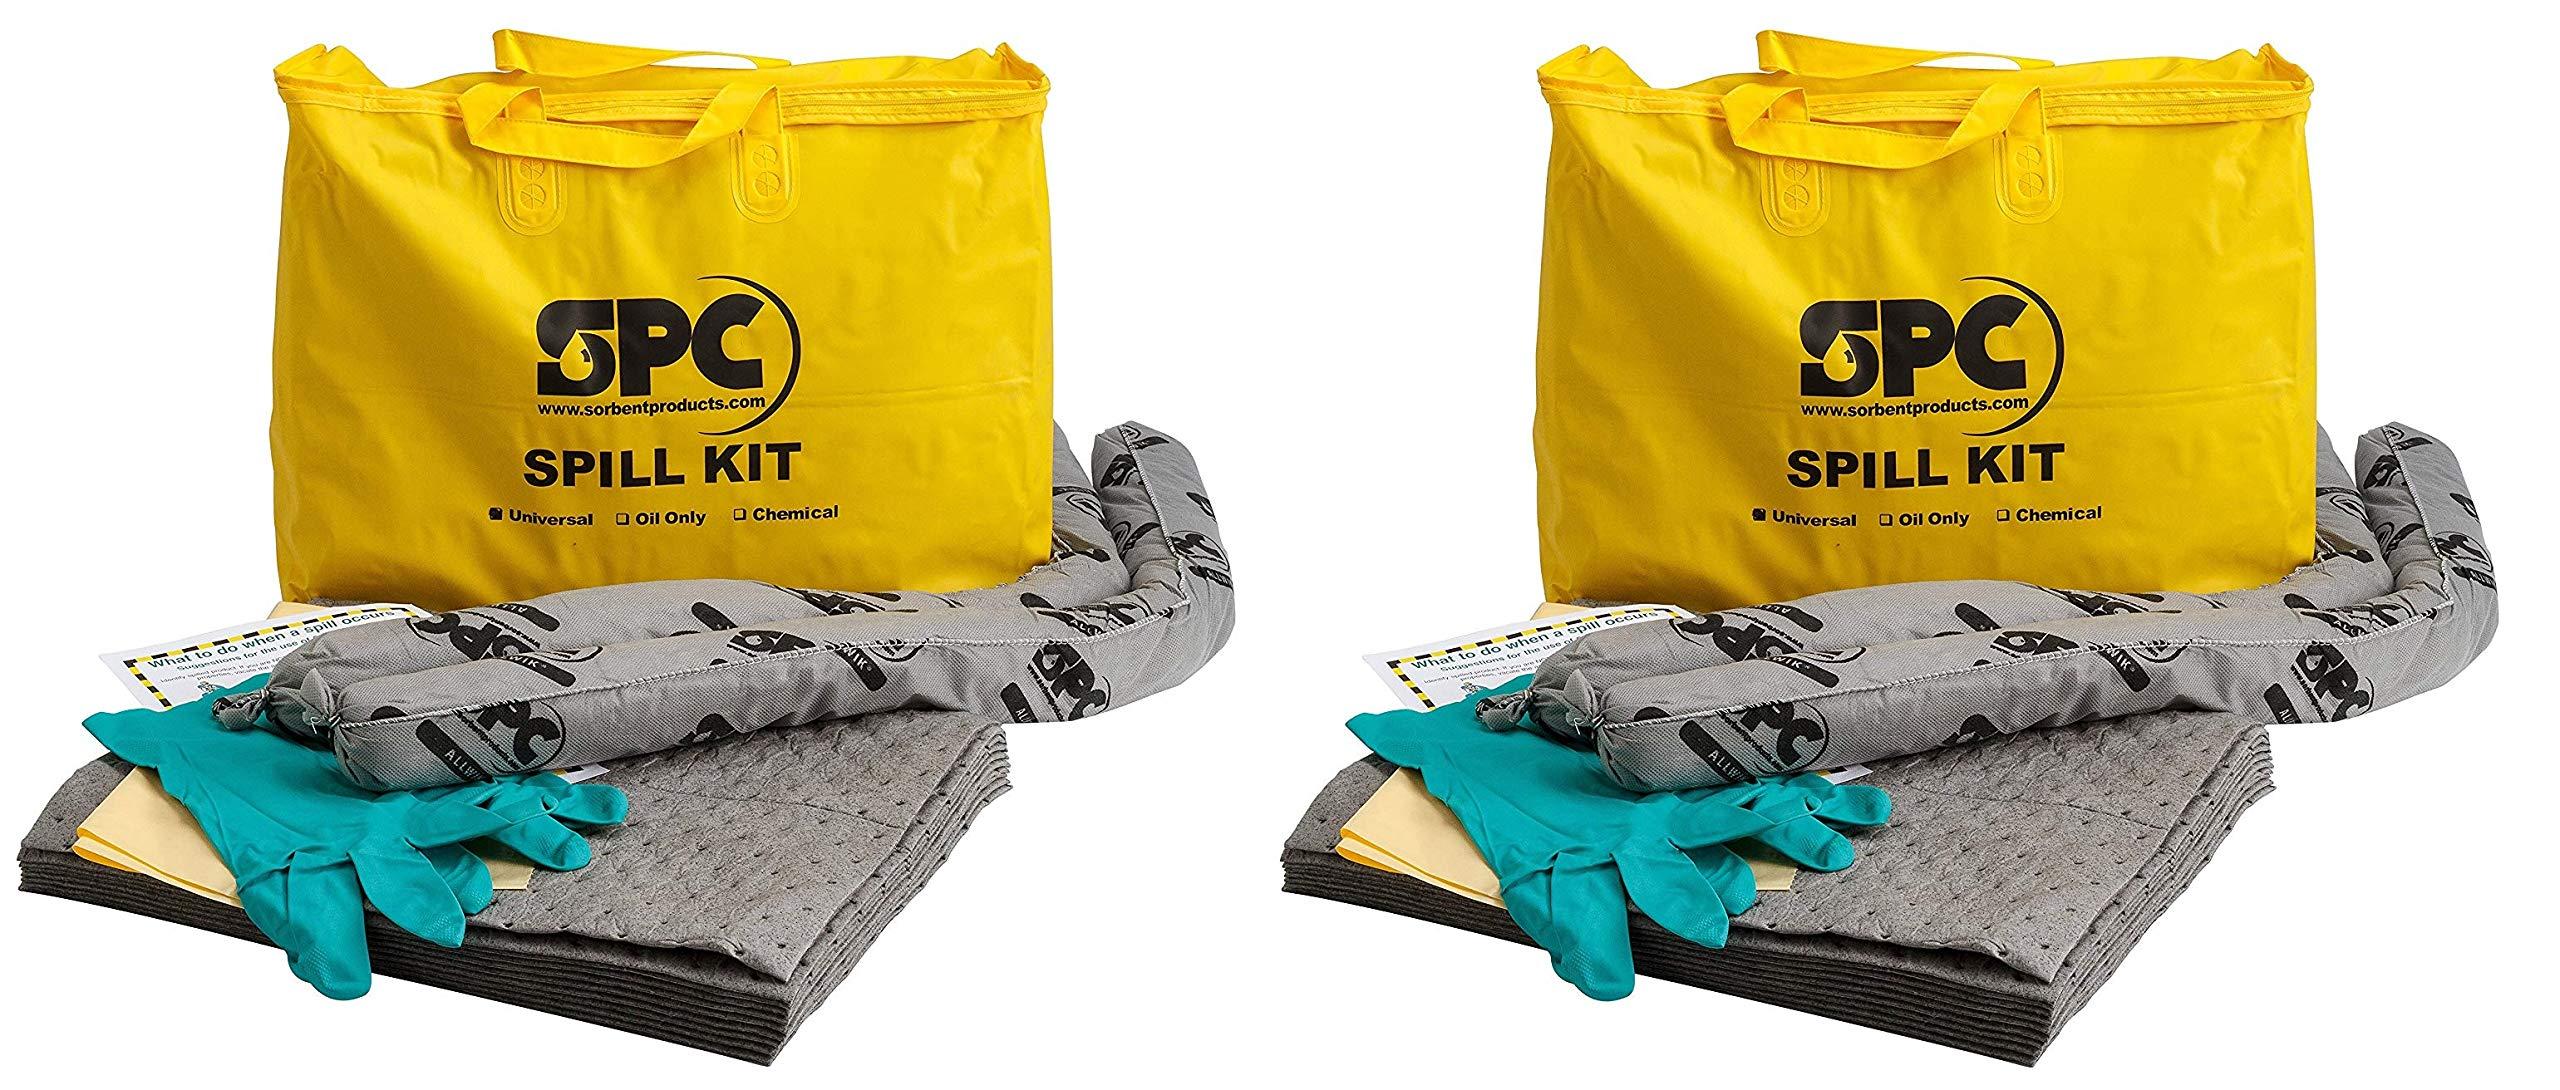 Brady SPC Allwik Universal Economy Portable Spill Kit - 107795 (Pack of 2)